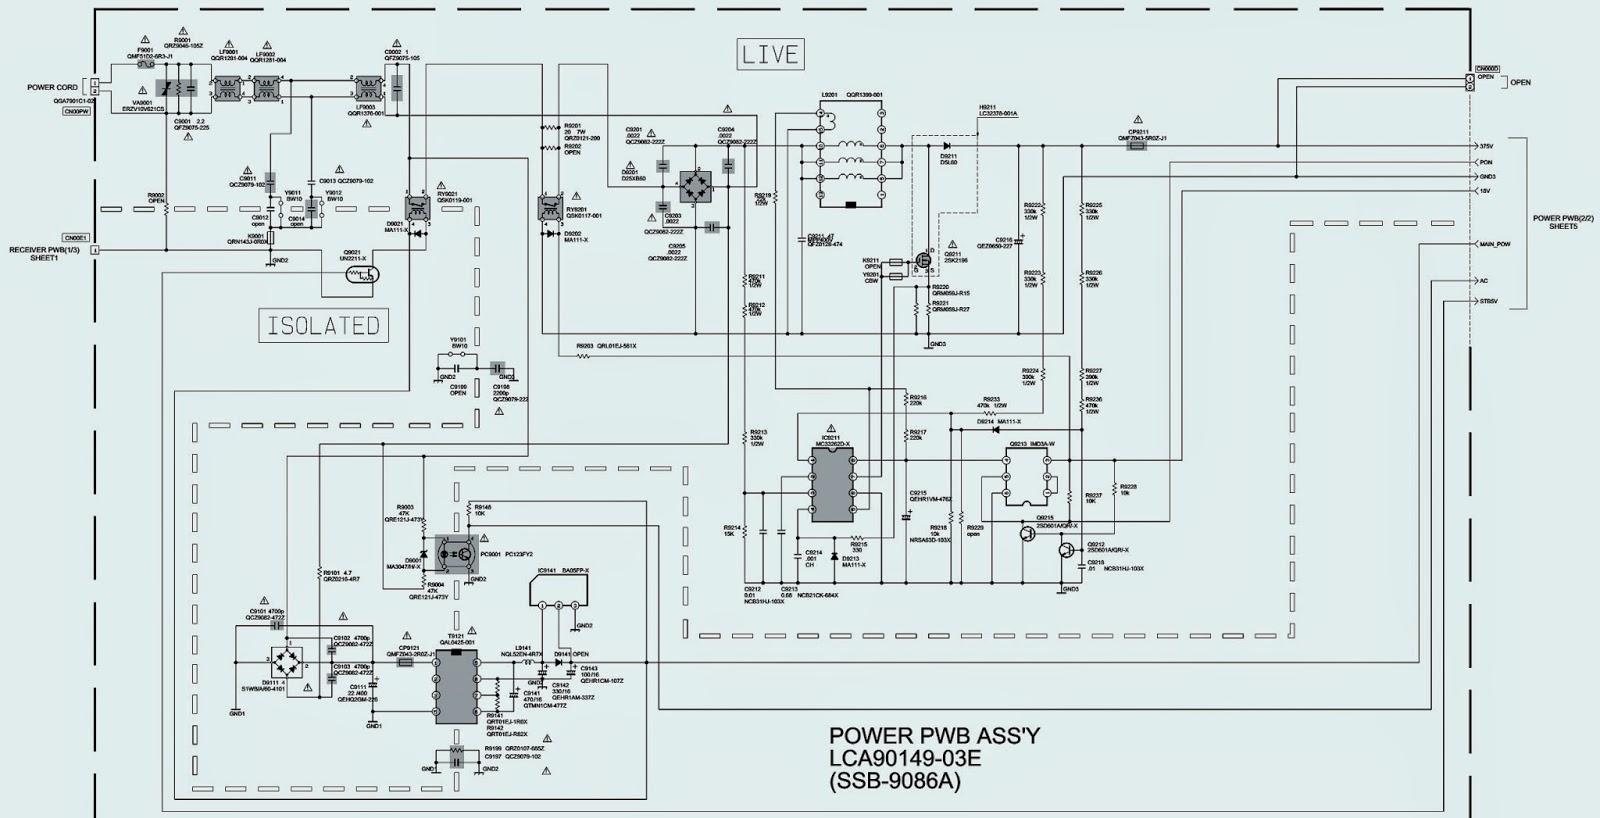 sony tv circuit diagram jvc lt26wx84/t – lcd flat tv – power supply regulator ...